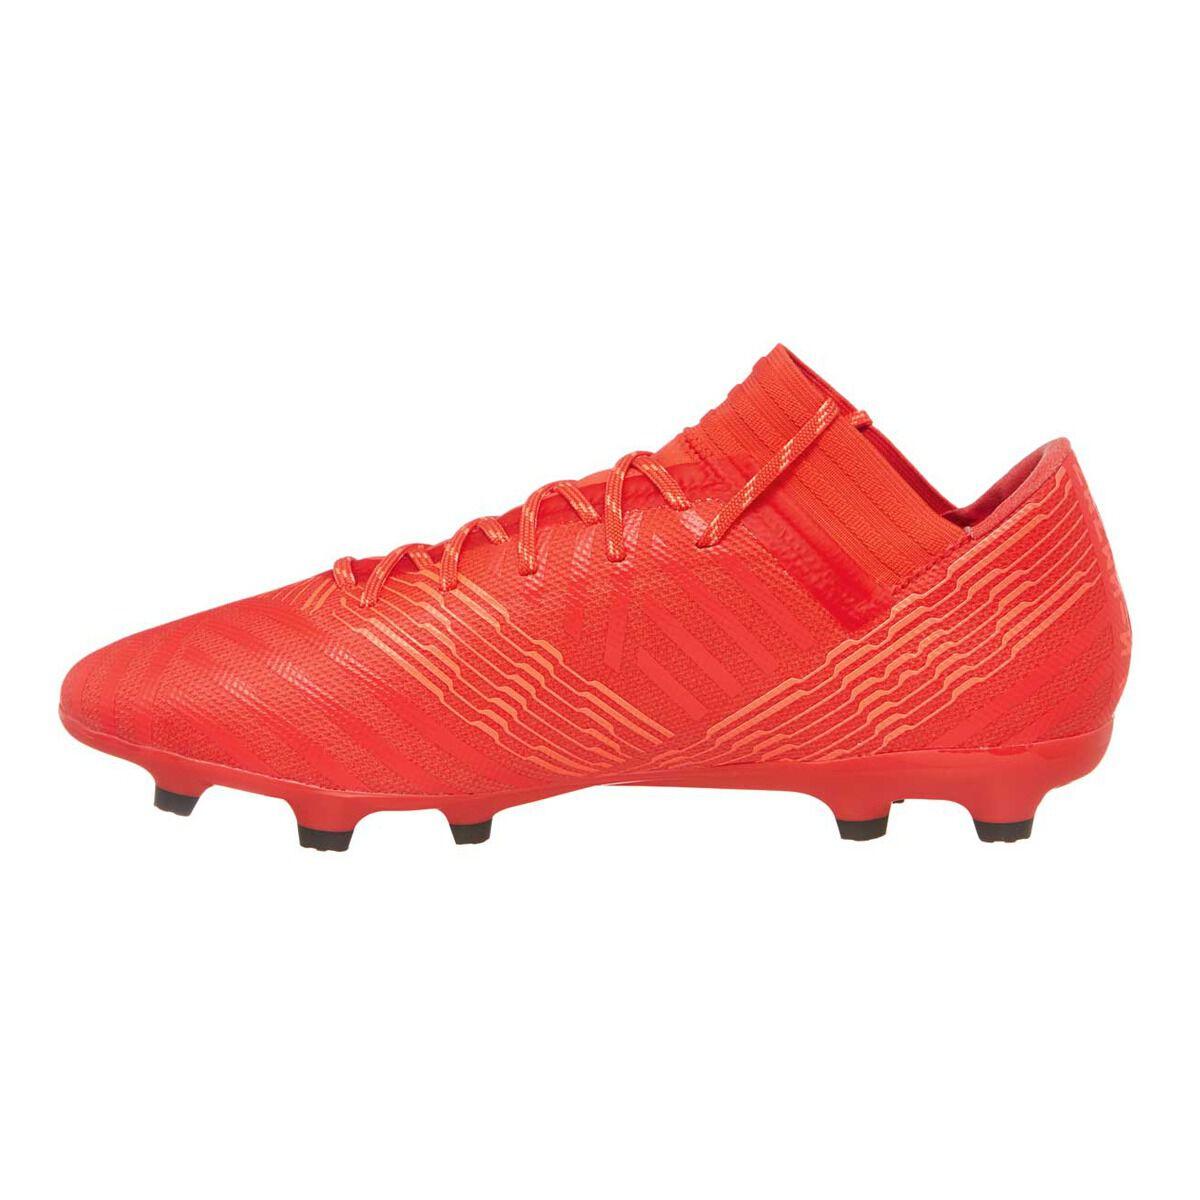 f5619248b844 ... switzerland adidas nemeziz 17.3 fg mens football boots orange red us 7  adult orange 34612 a2515